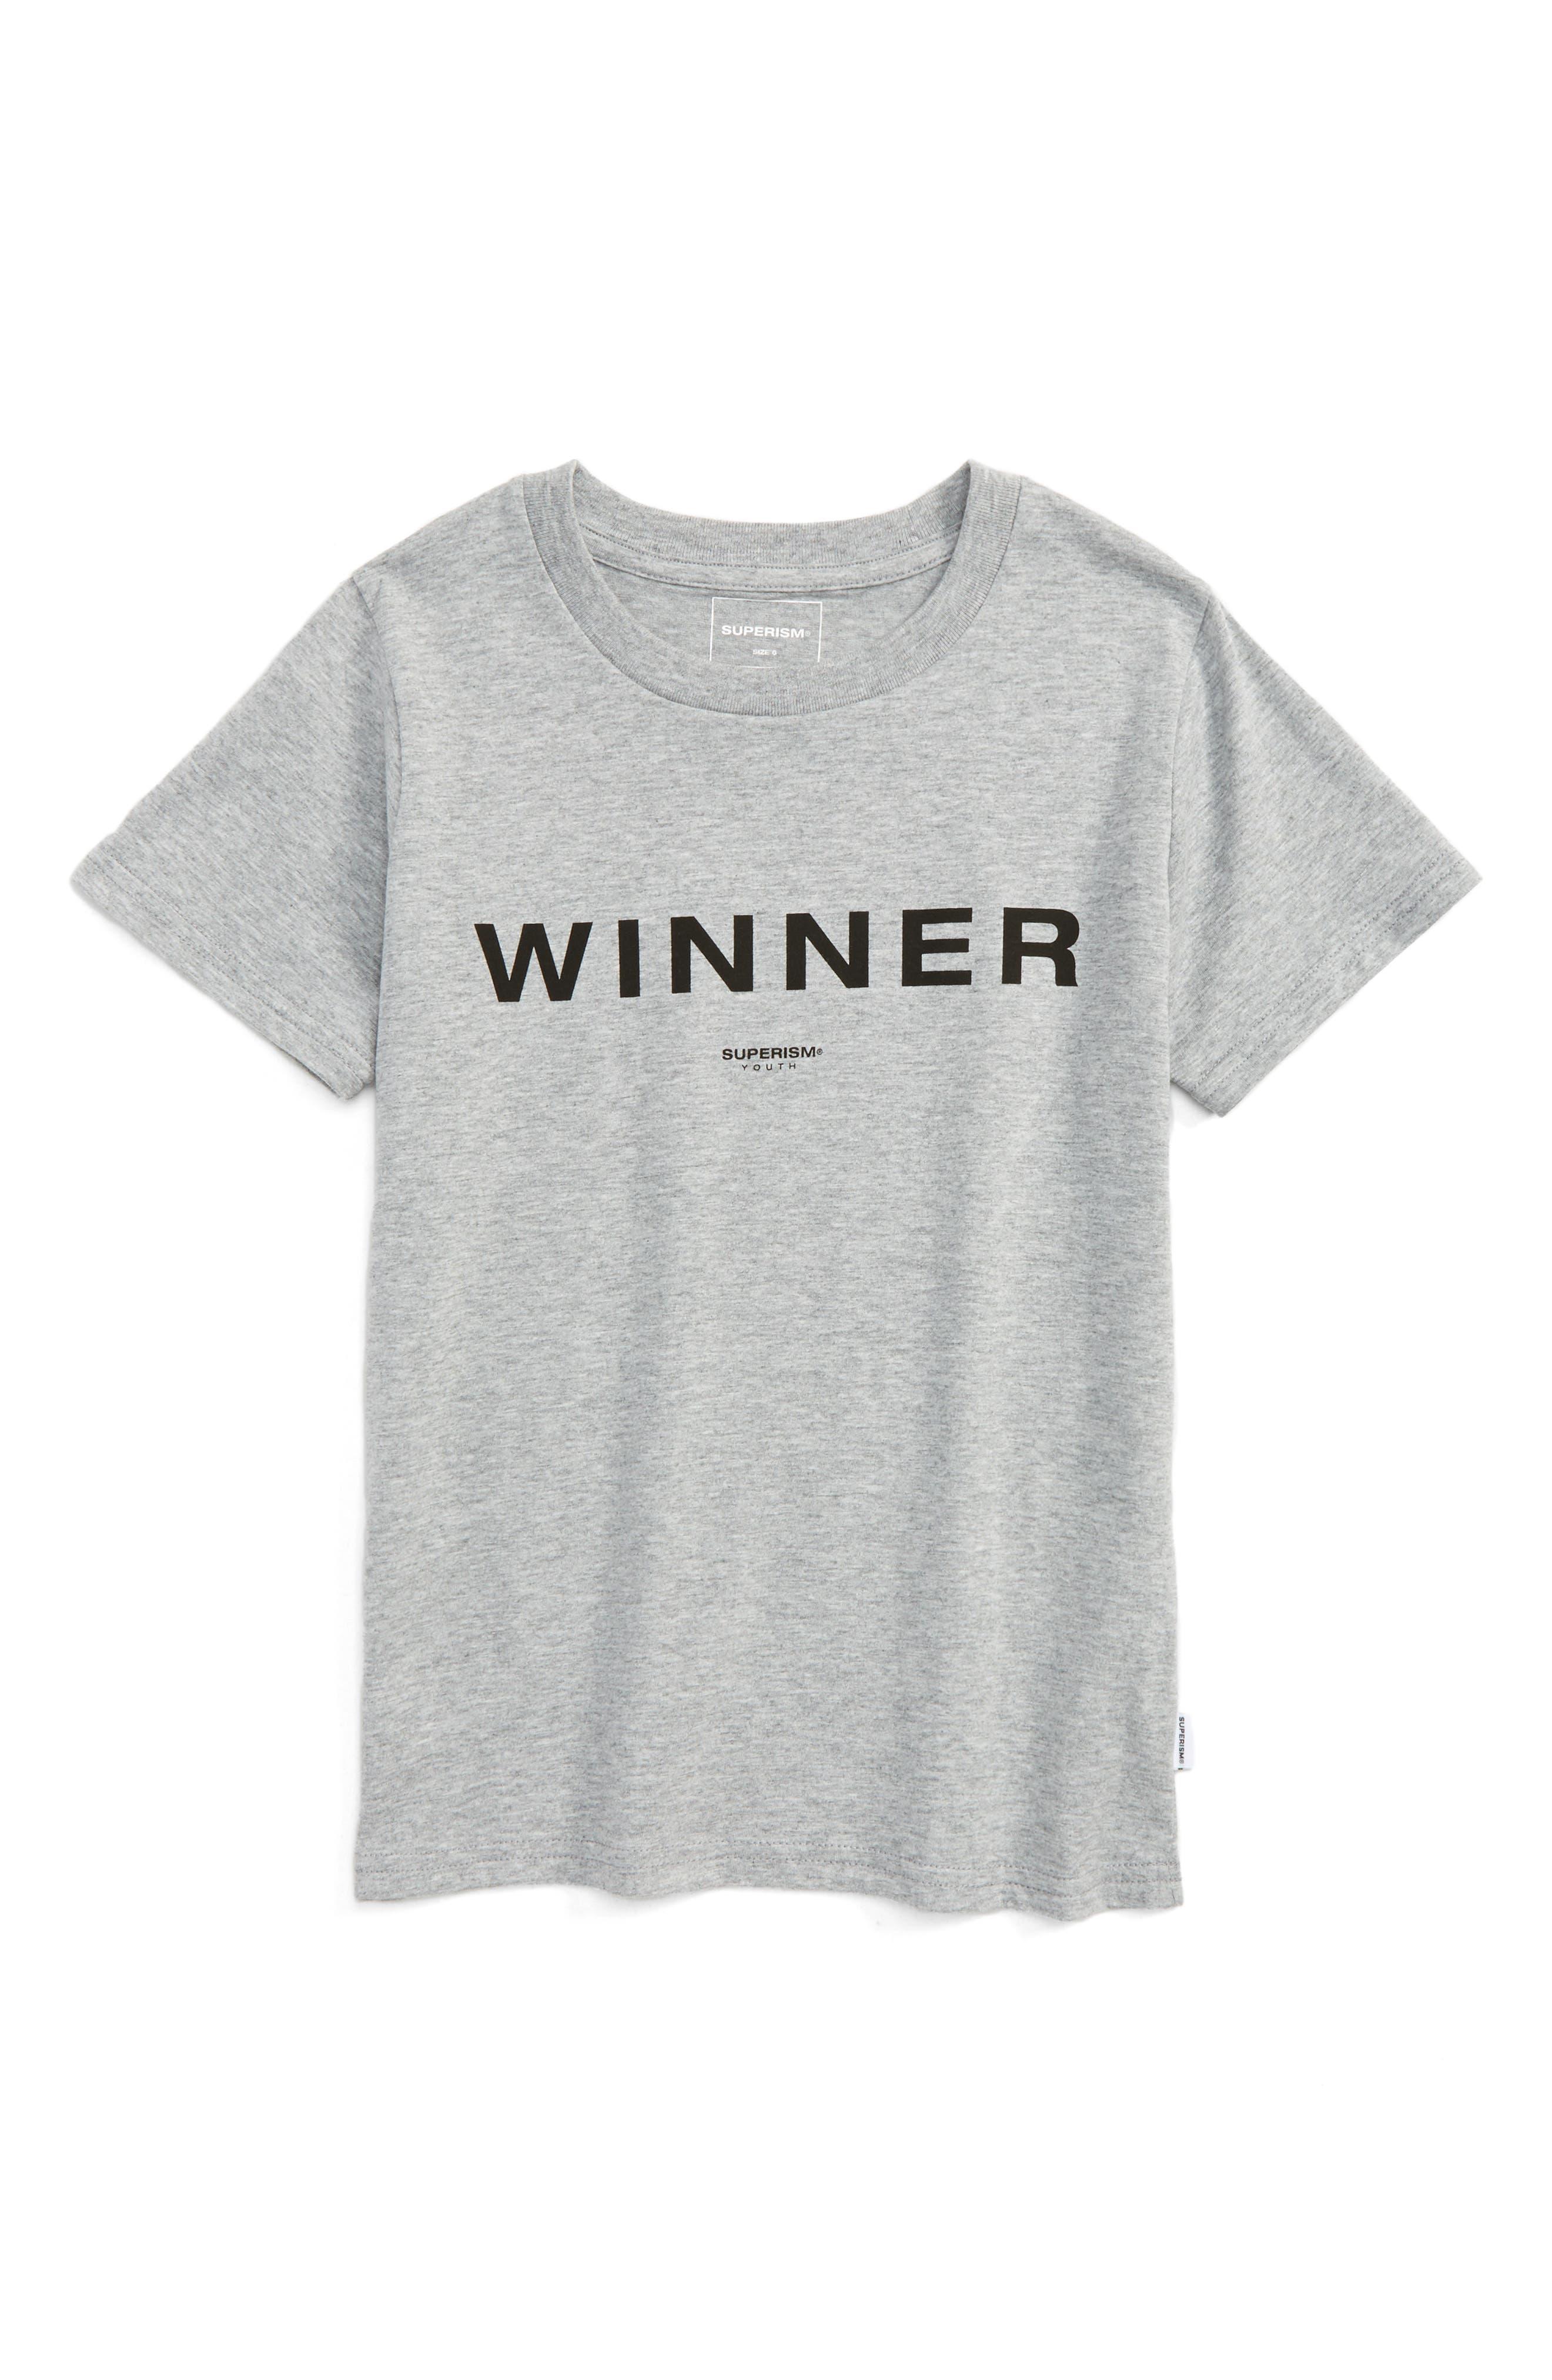 Main Image - Superism Winner T-Shirt (Toddler Boys & Little Boys)